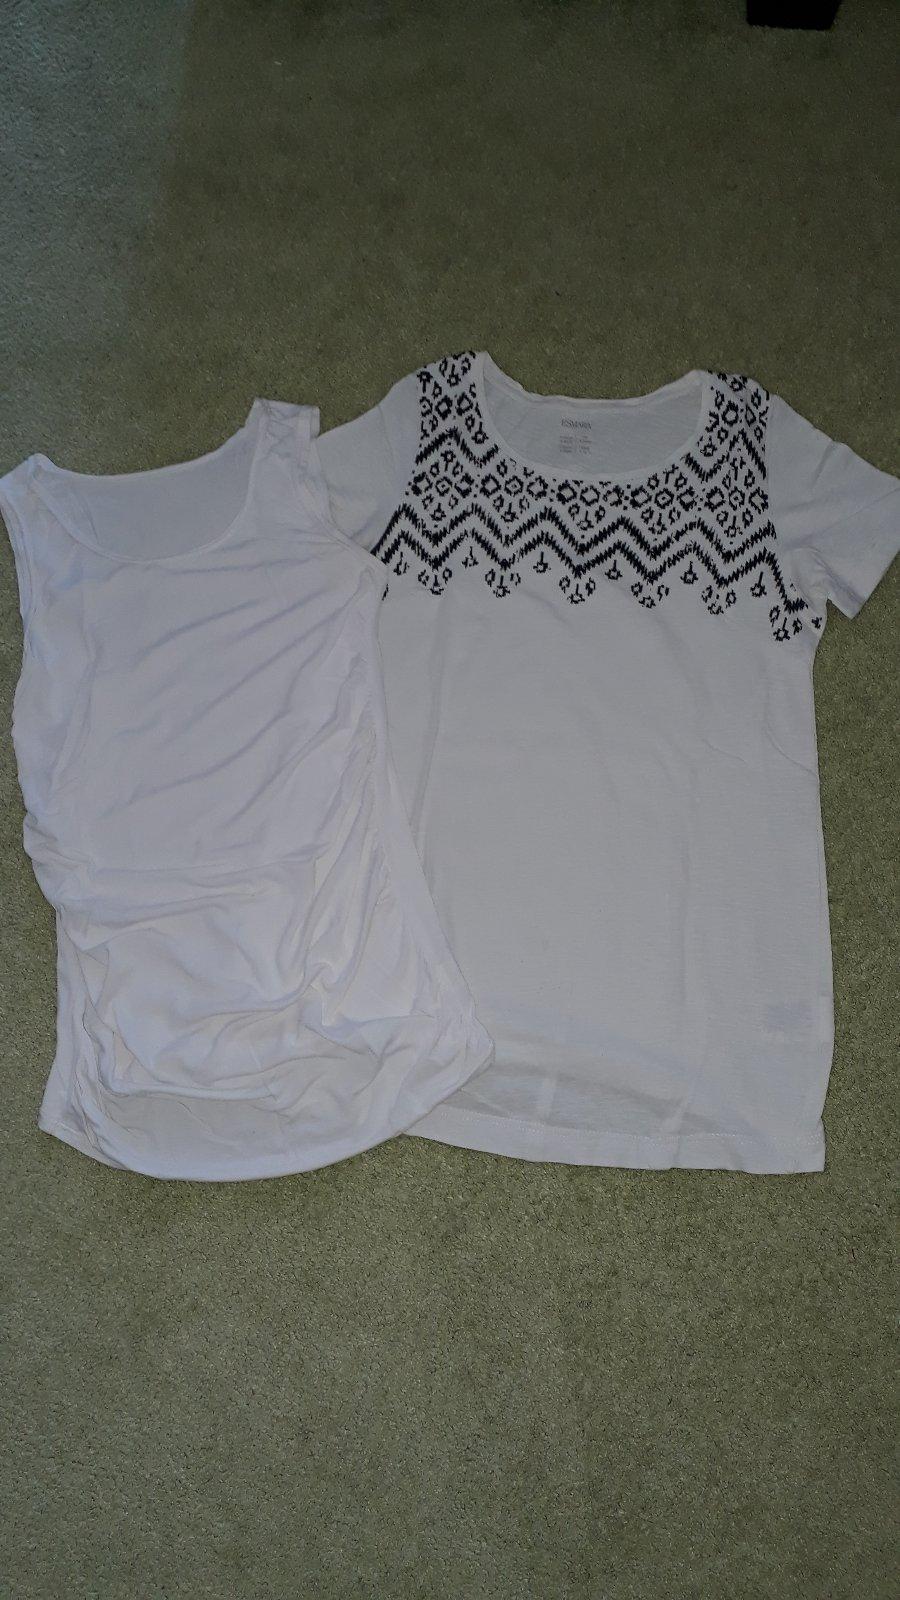 eea4dbe7a611 Tehotenské tričko 2ks